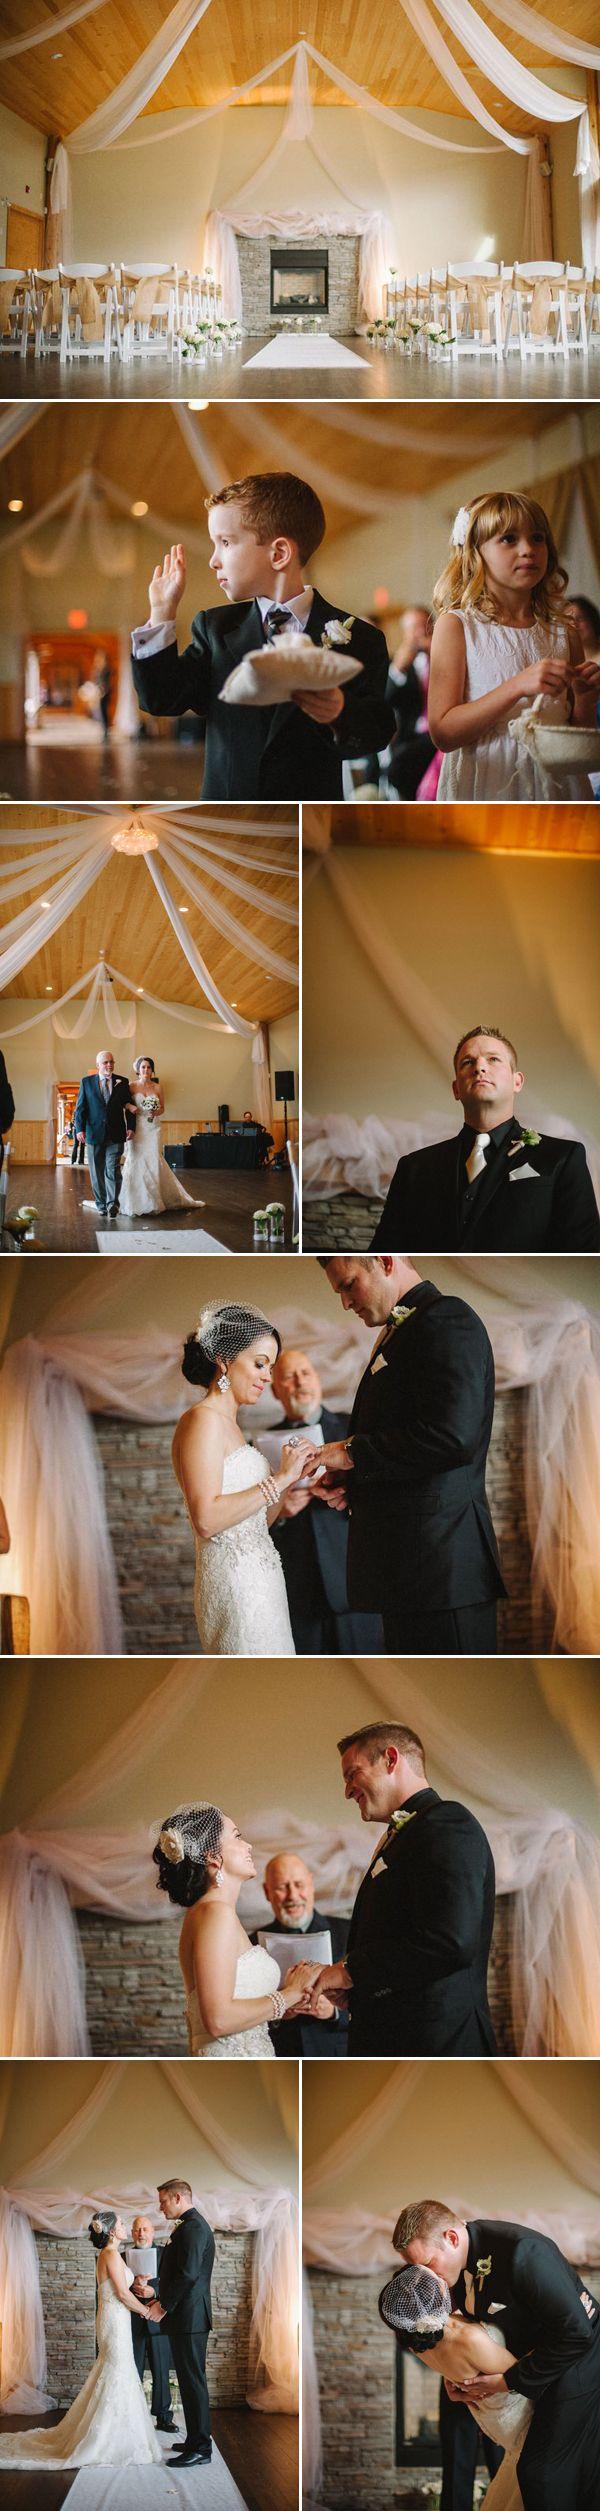 Christy Scotts Fraser River Lodge Wedding From Mathias Fast